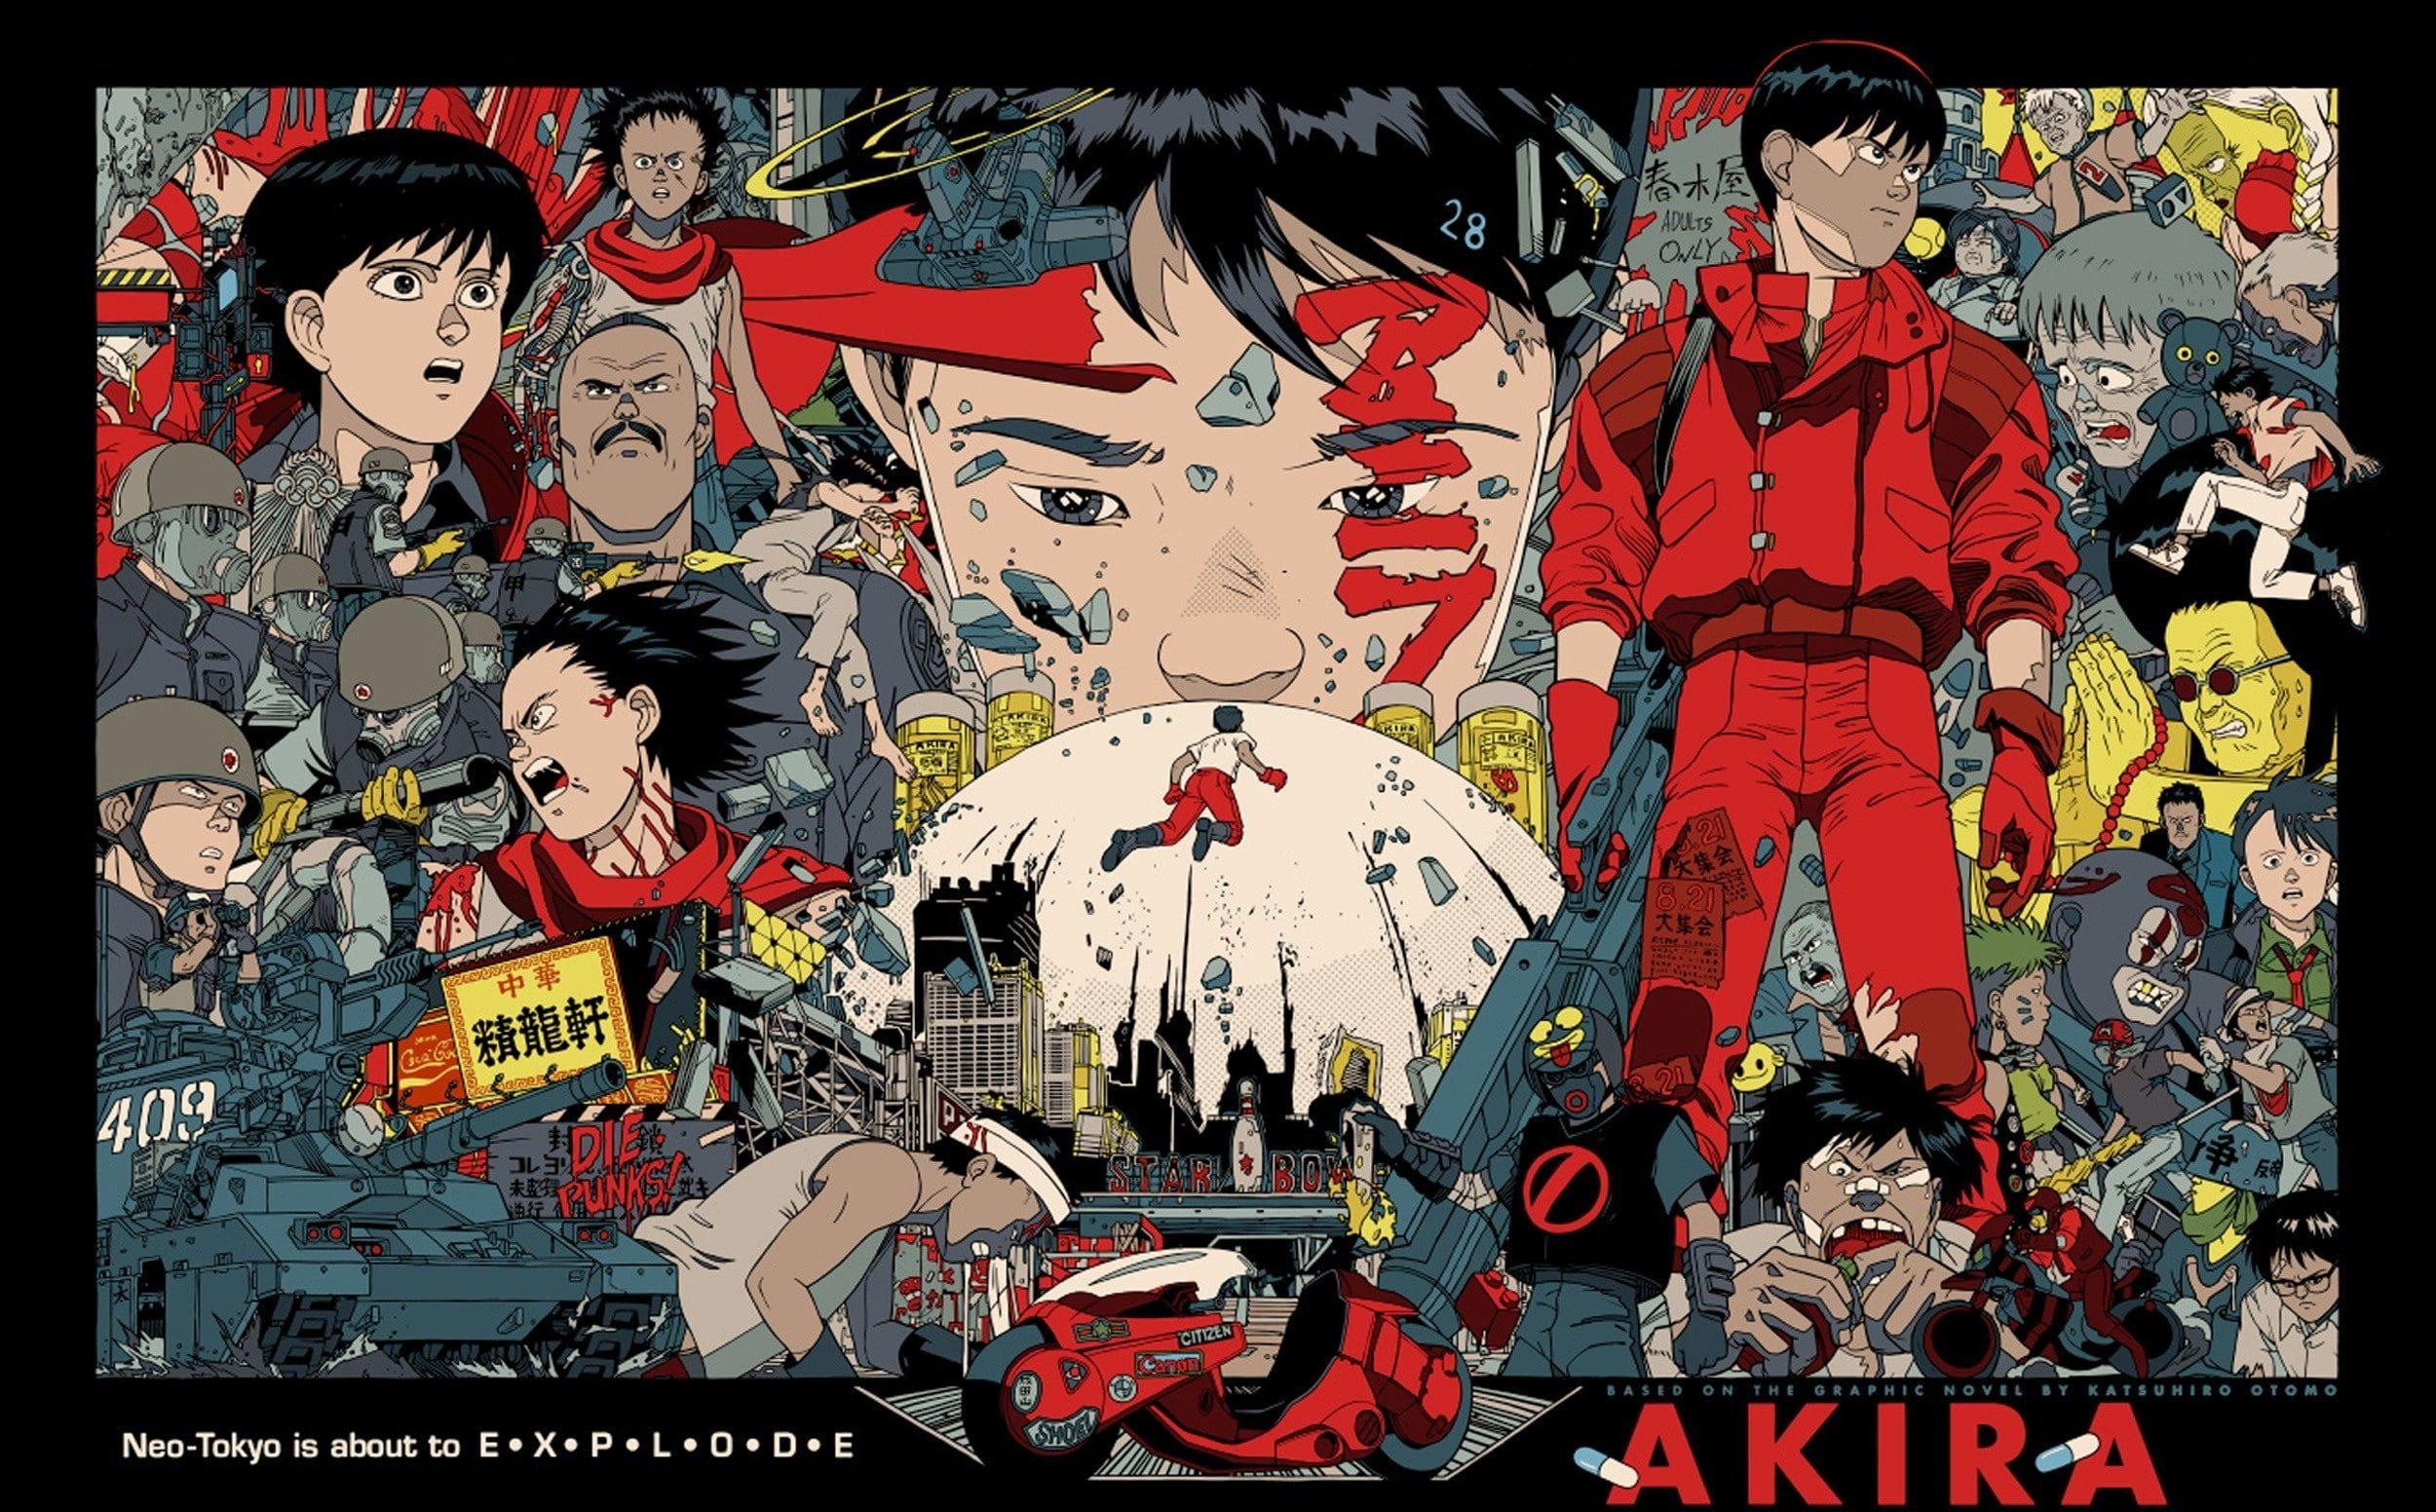 Akira Tetsuo Pills Anime Kaneda Anime Akira Hd Art Akira Tetsuo 1080p Wallpaper Hdwallpaper Desktop In 2020 Anime Akira Akira Tetsuo